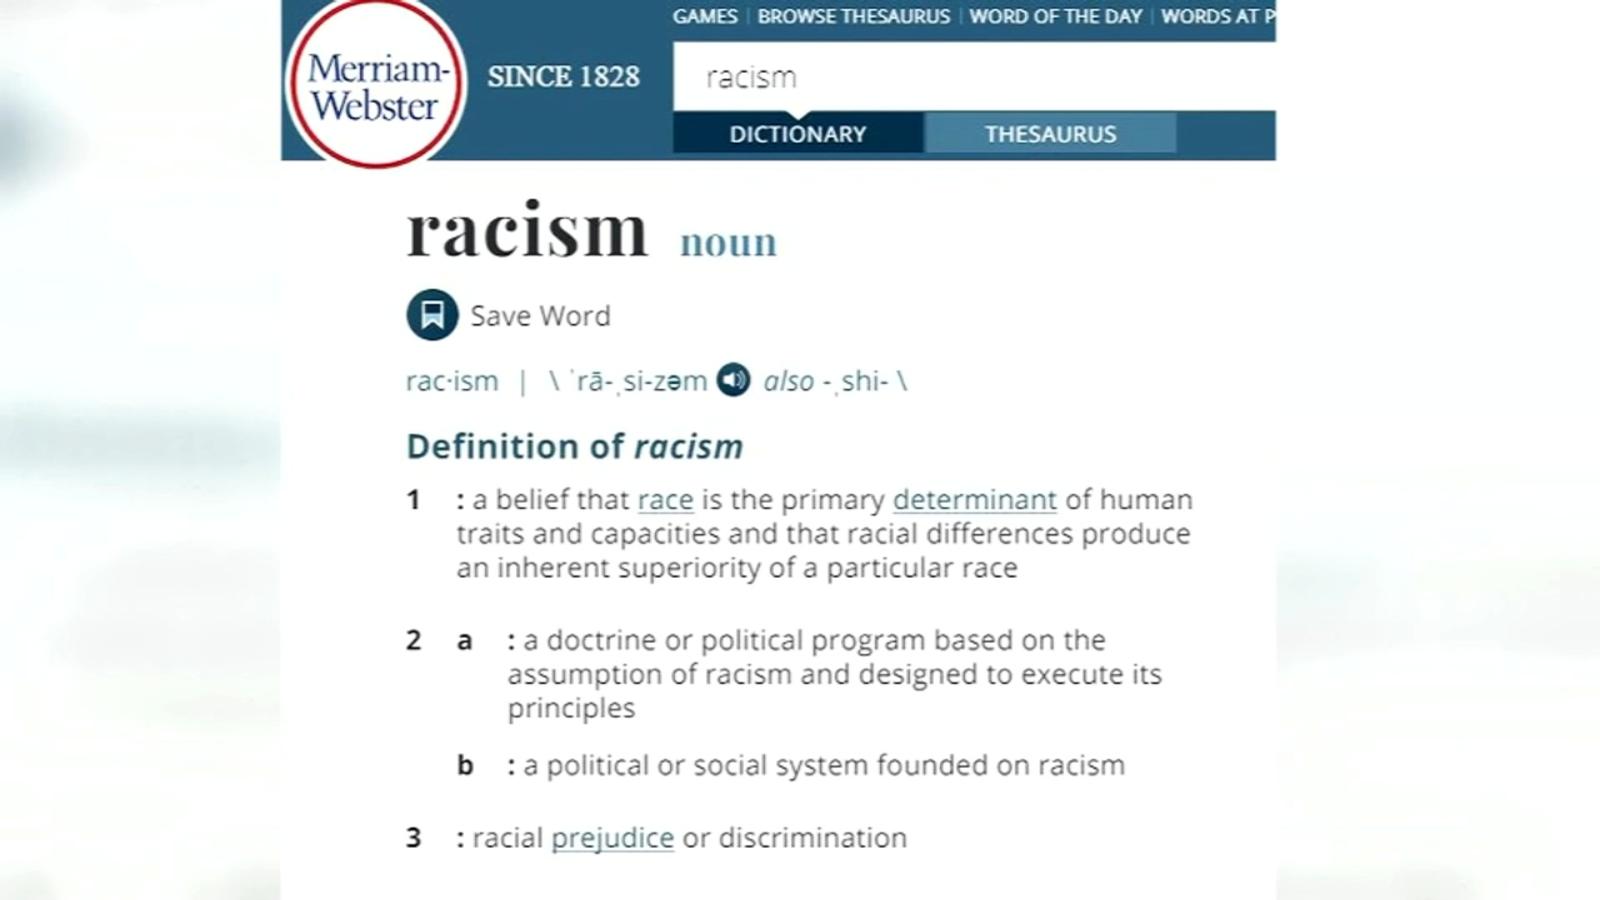 Missouri woman prompts Merriam-Webster to redefine racism